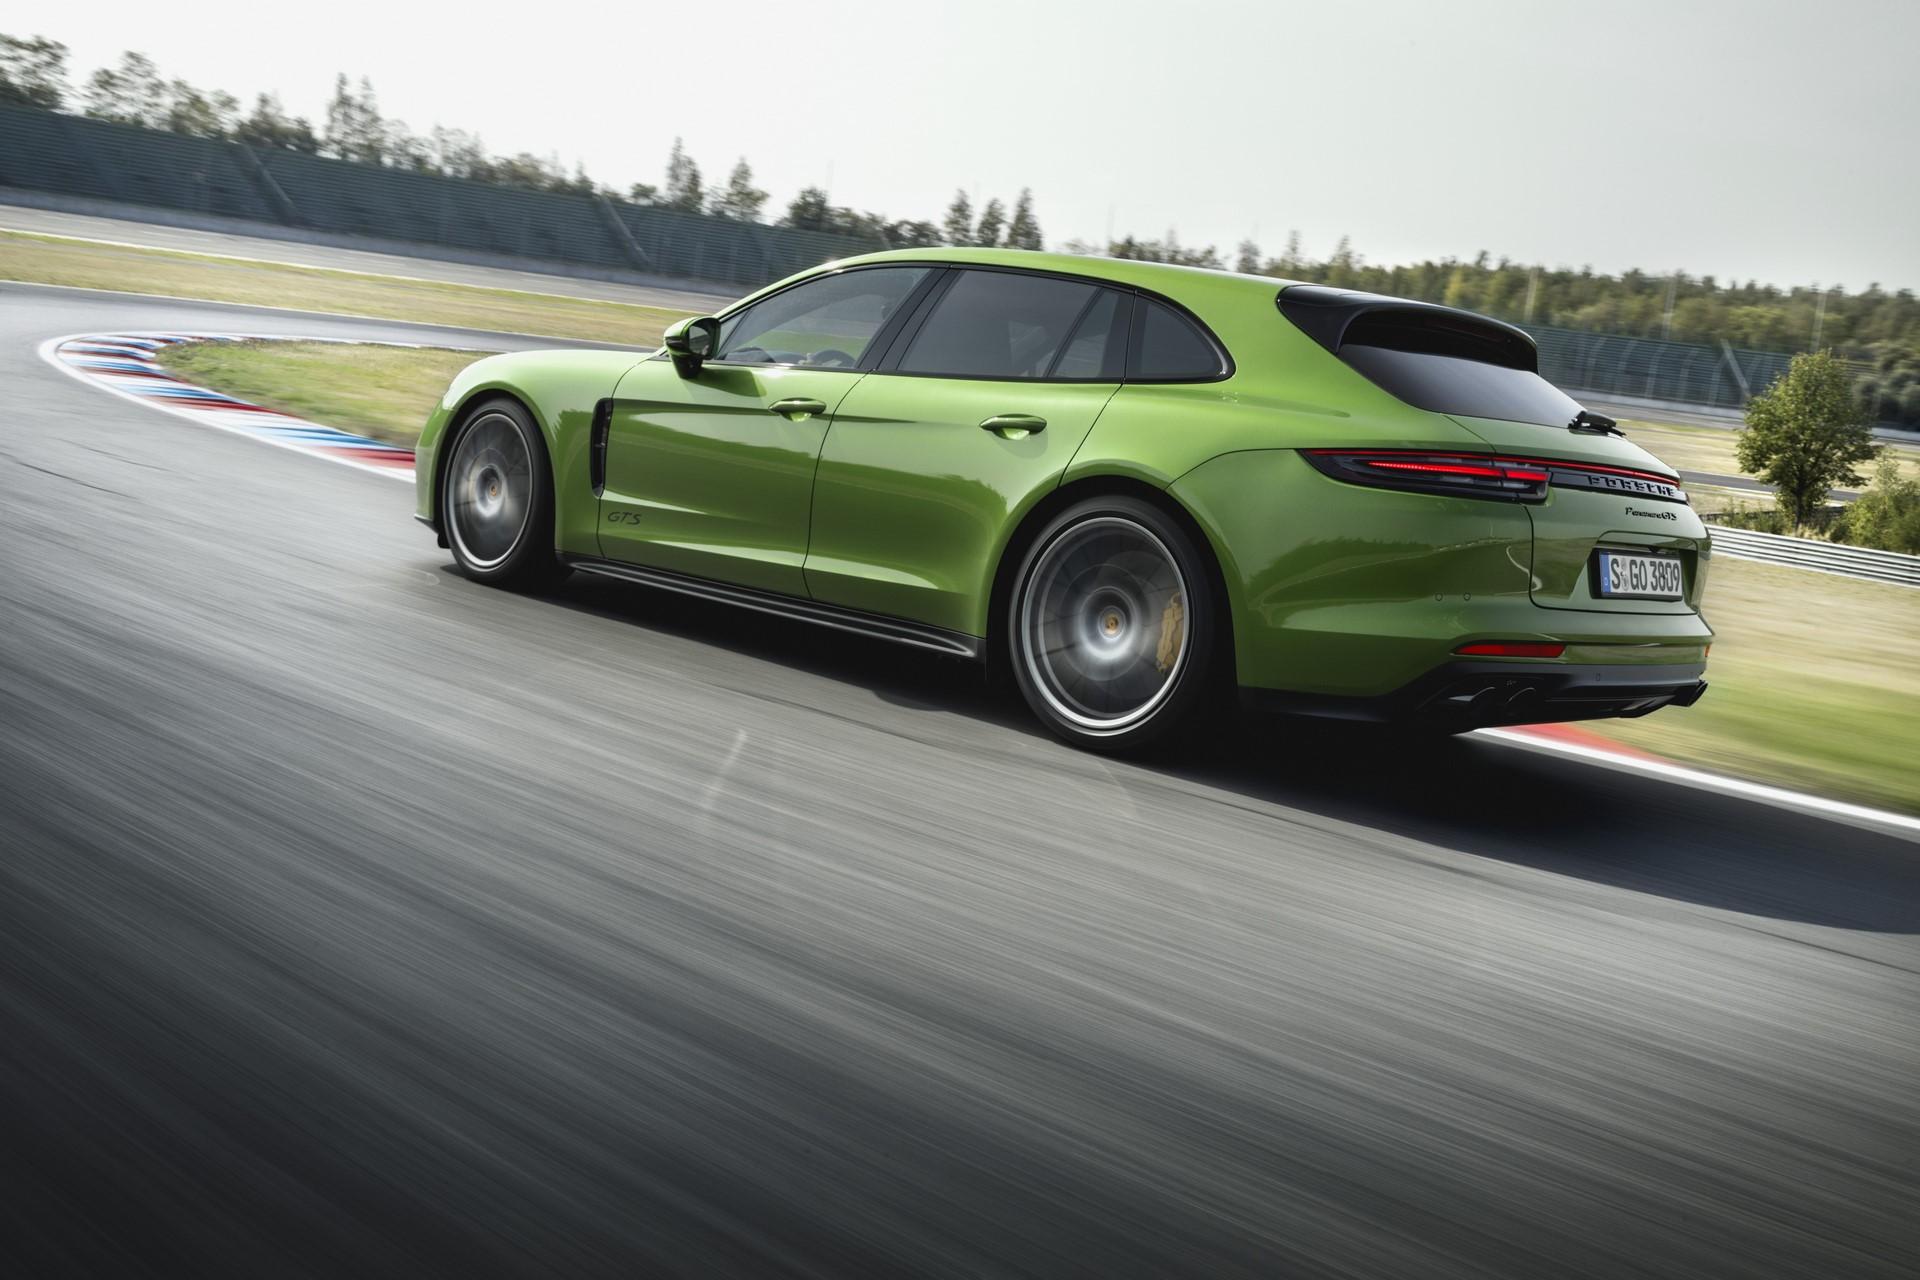 Porsche Panamera GTS and Panamera GTS Sport Turismo (8)